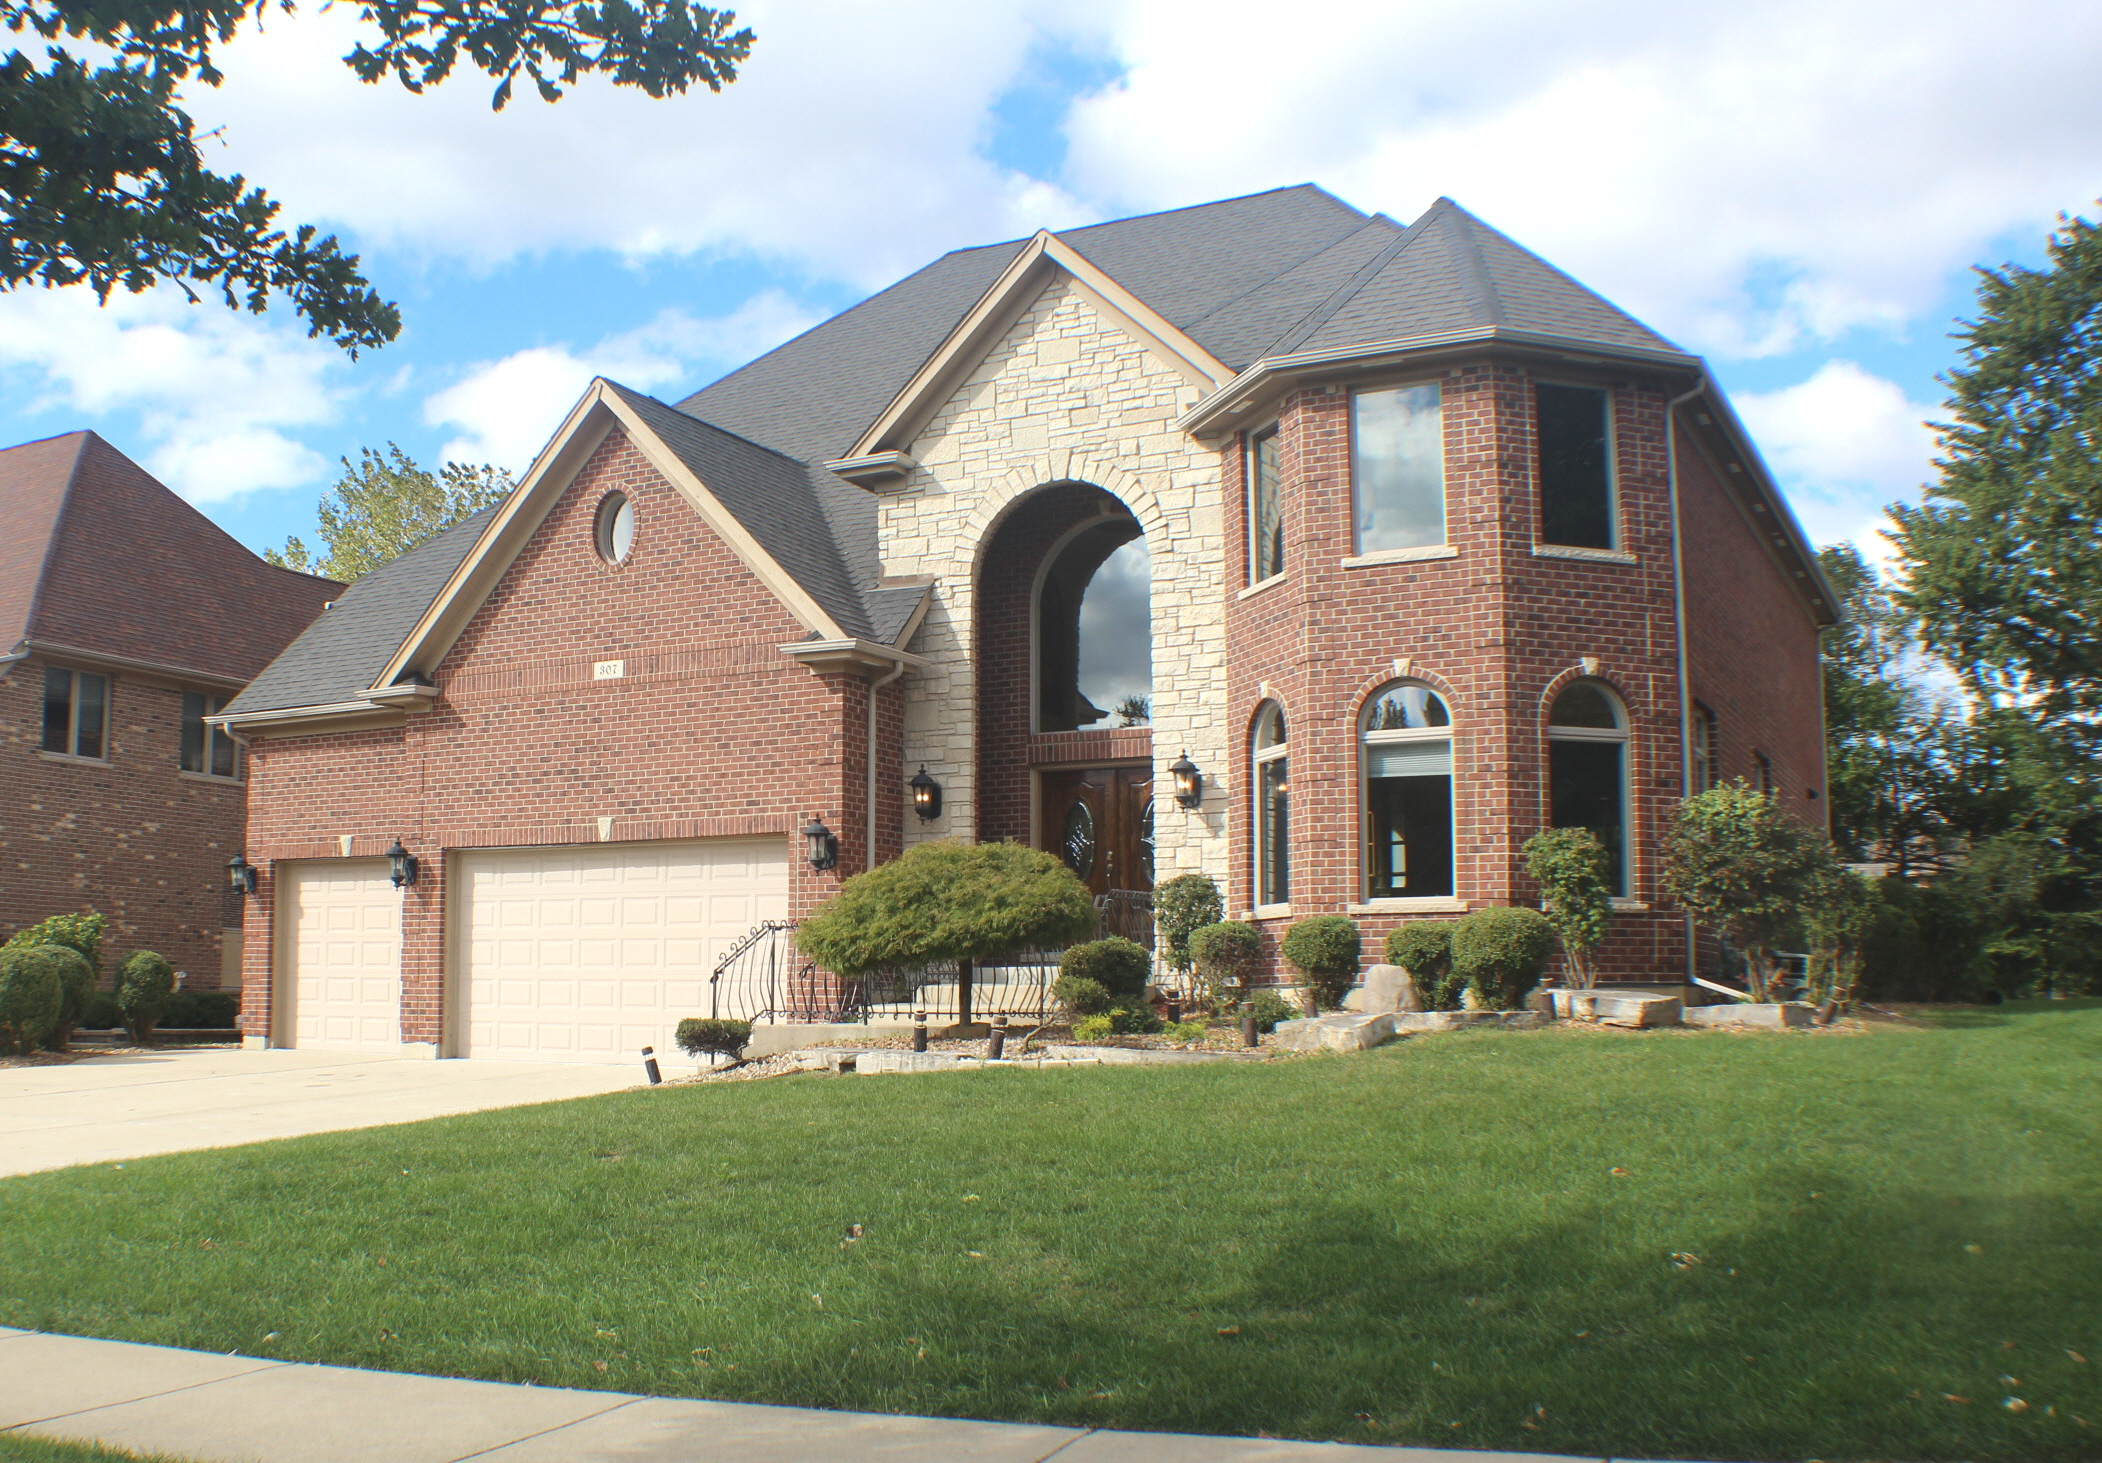 307 Juliana Ln, Bloomingdale, Illinois 60108